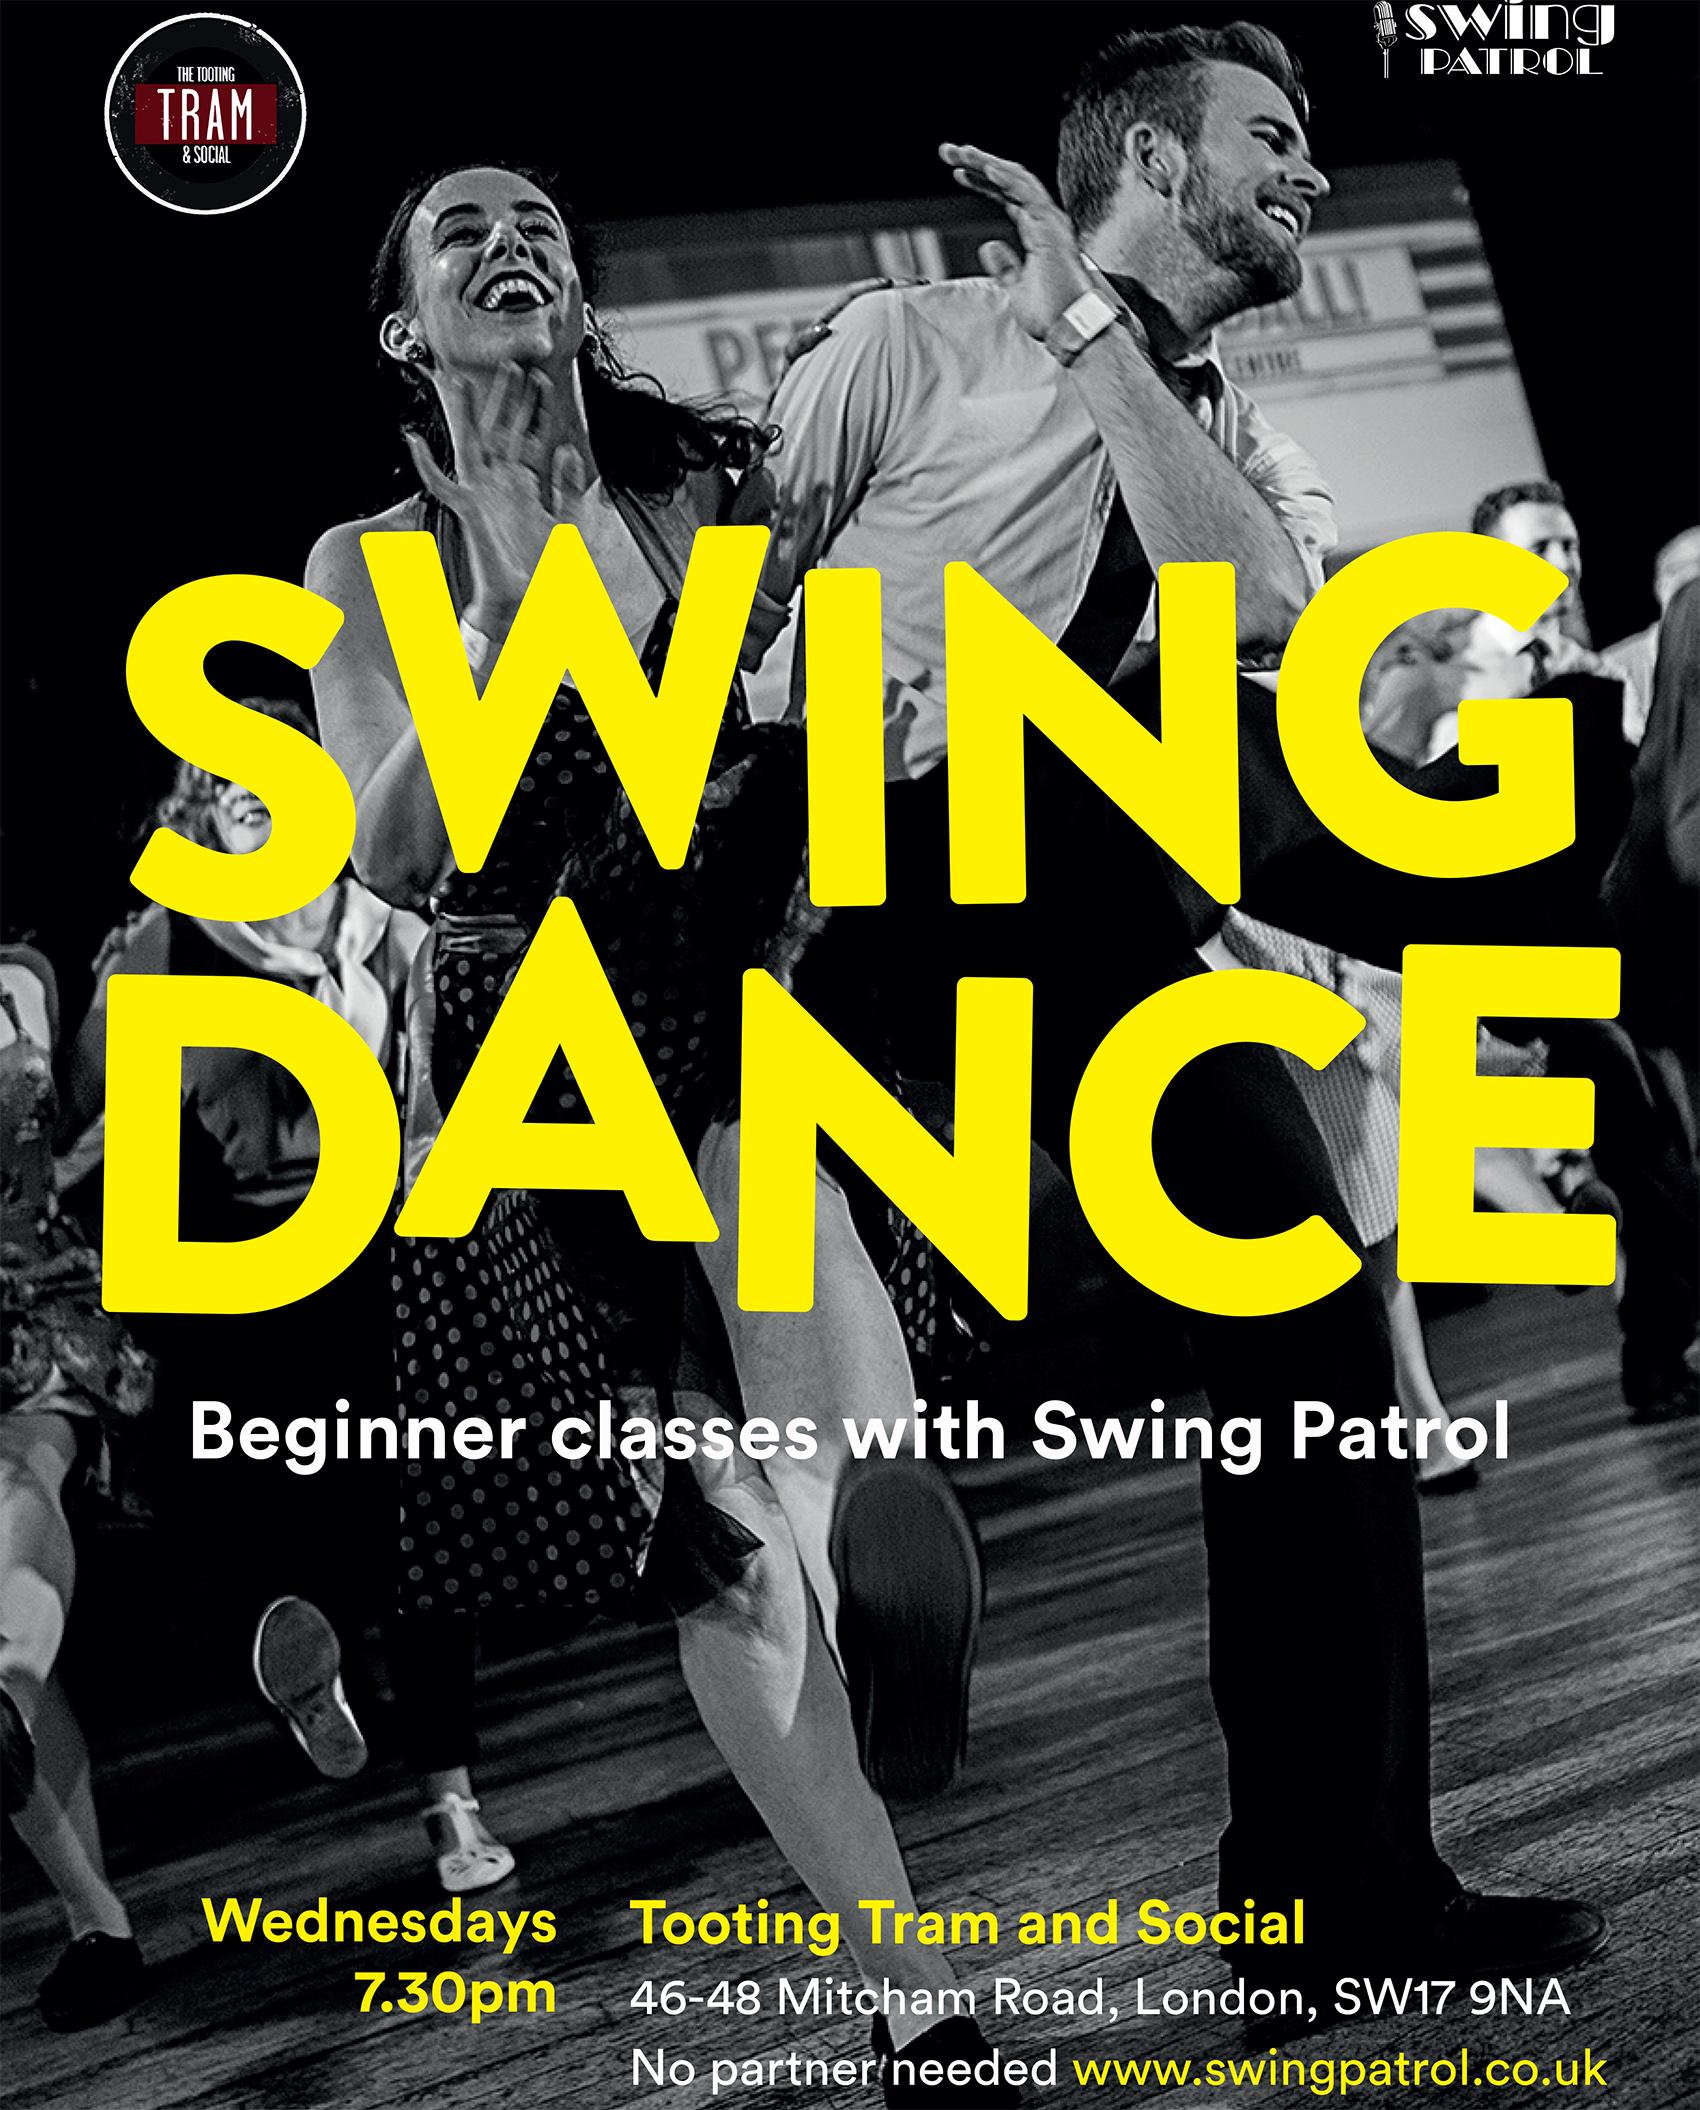 Swing Patrol: Amateur Swing Dance Classes